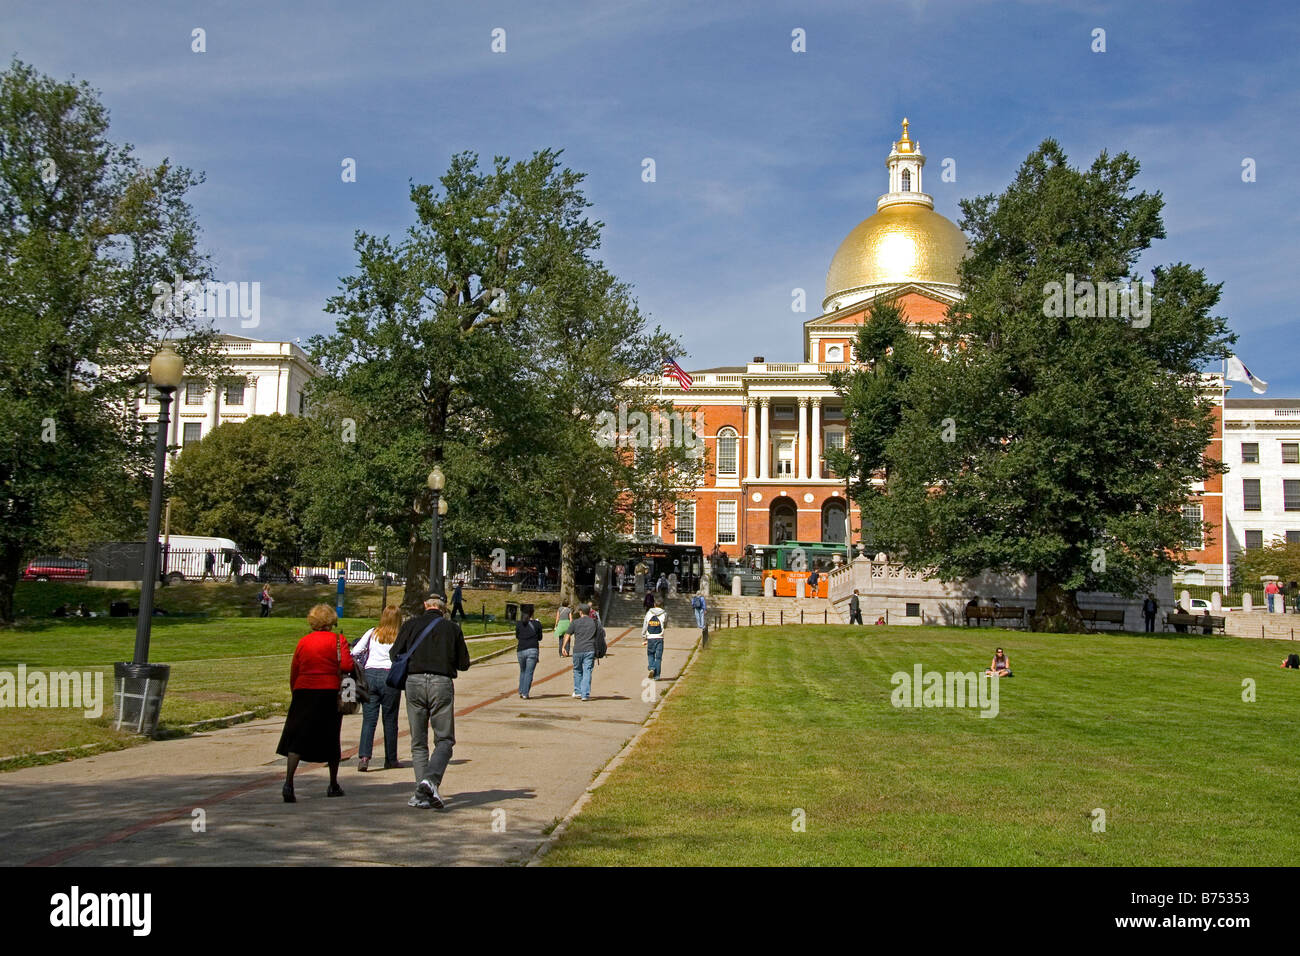 The Massachusetts State House and Boston Common located in the Beacon Hill neighborhood of Boston Massachusetts - Stock Image